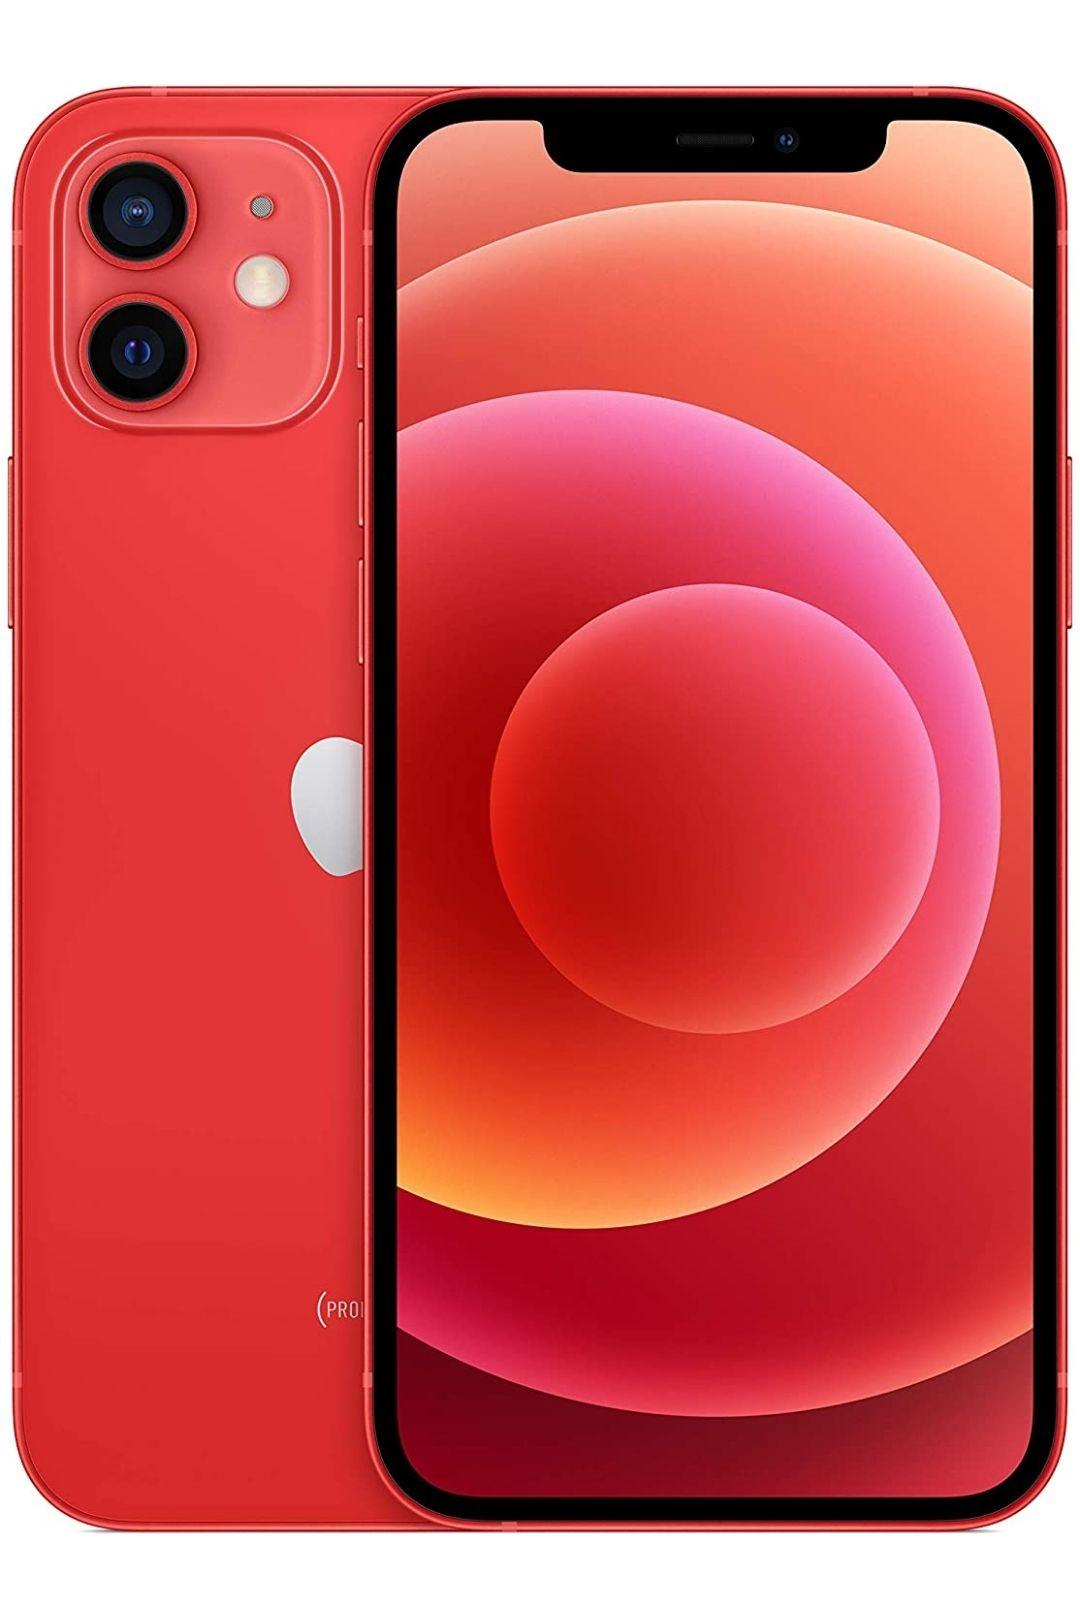 New Apple iPhone 12 (64GB) Blue / Red Smartphone - £699 @ Amazon